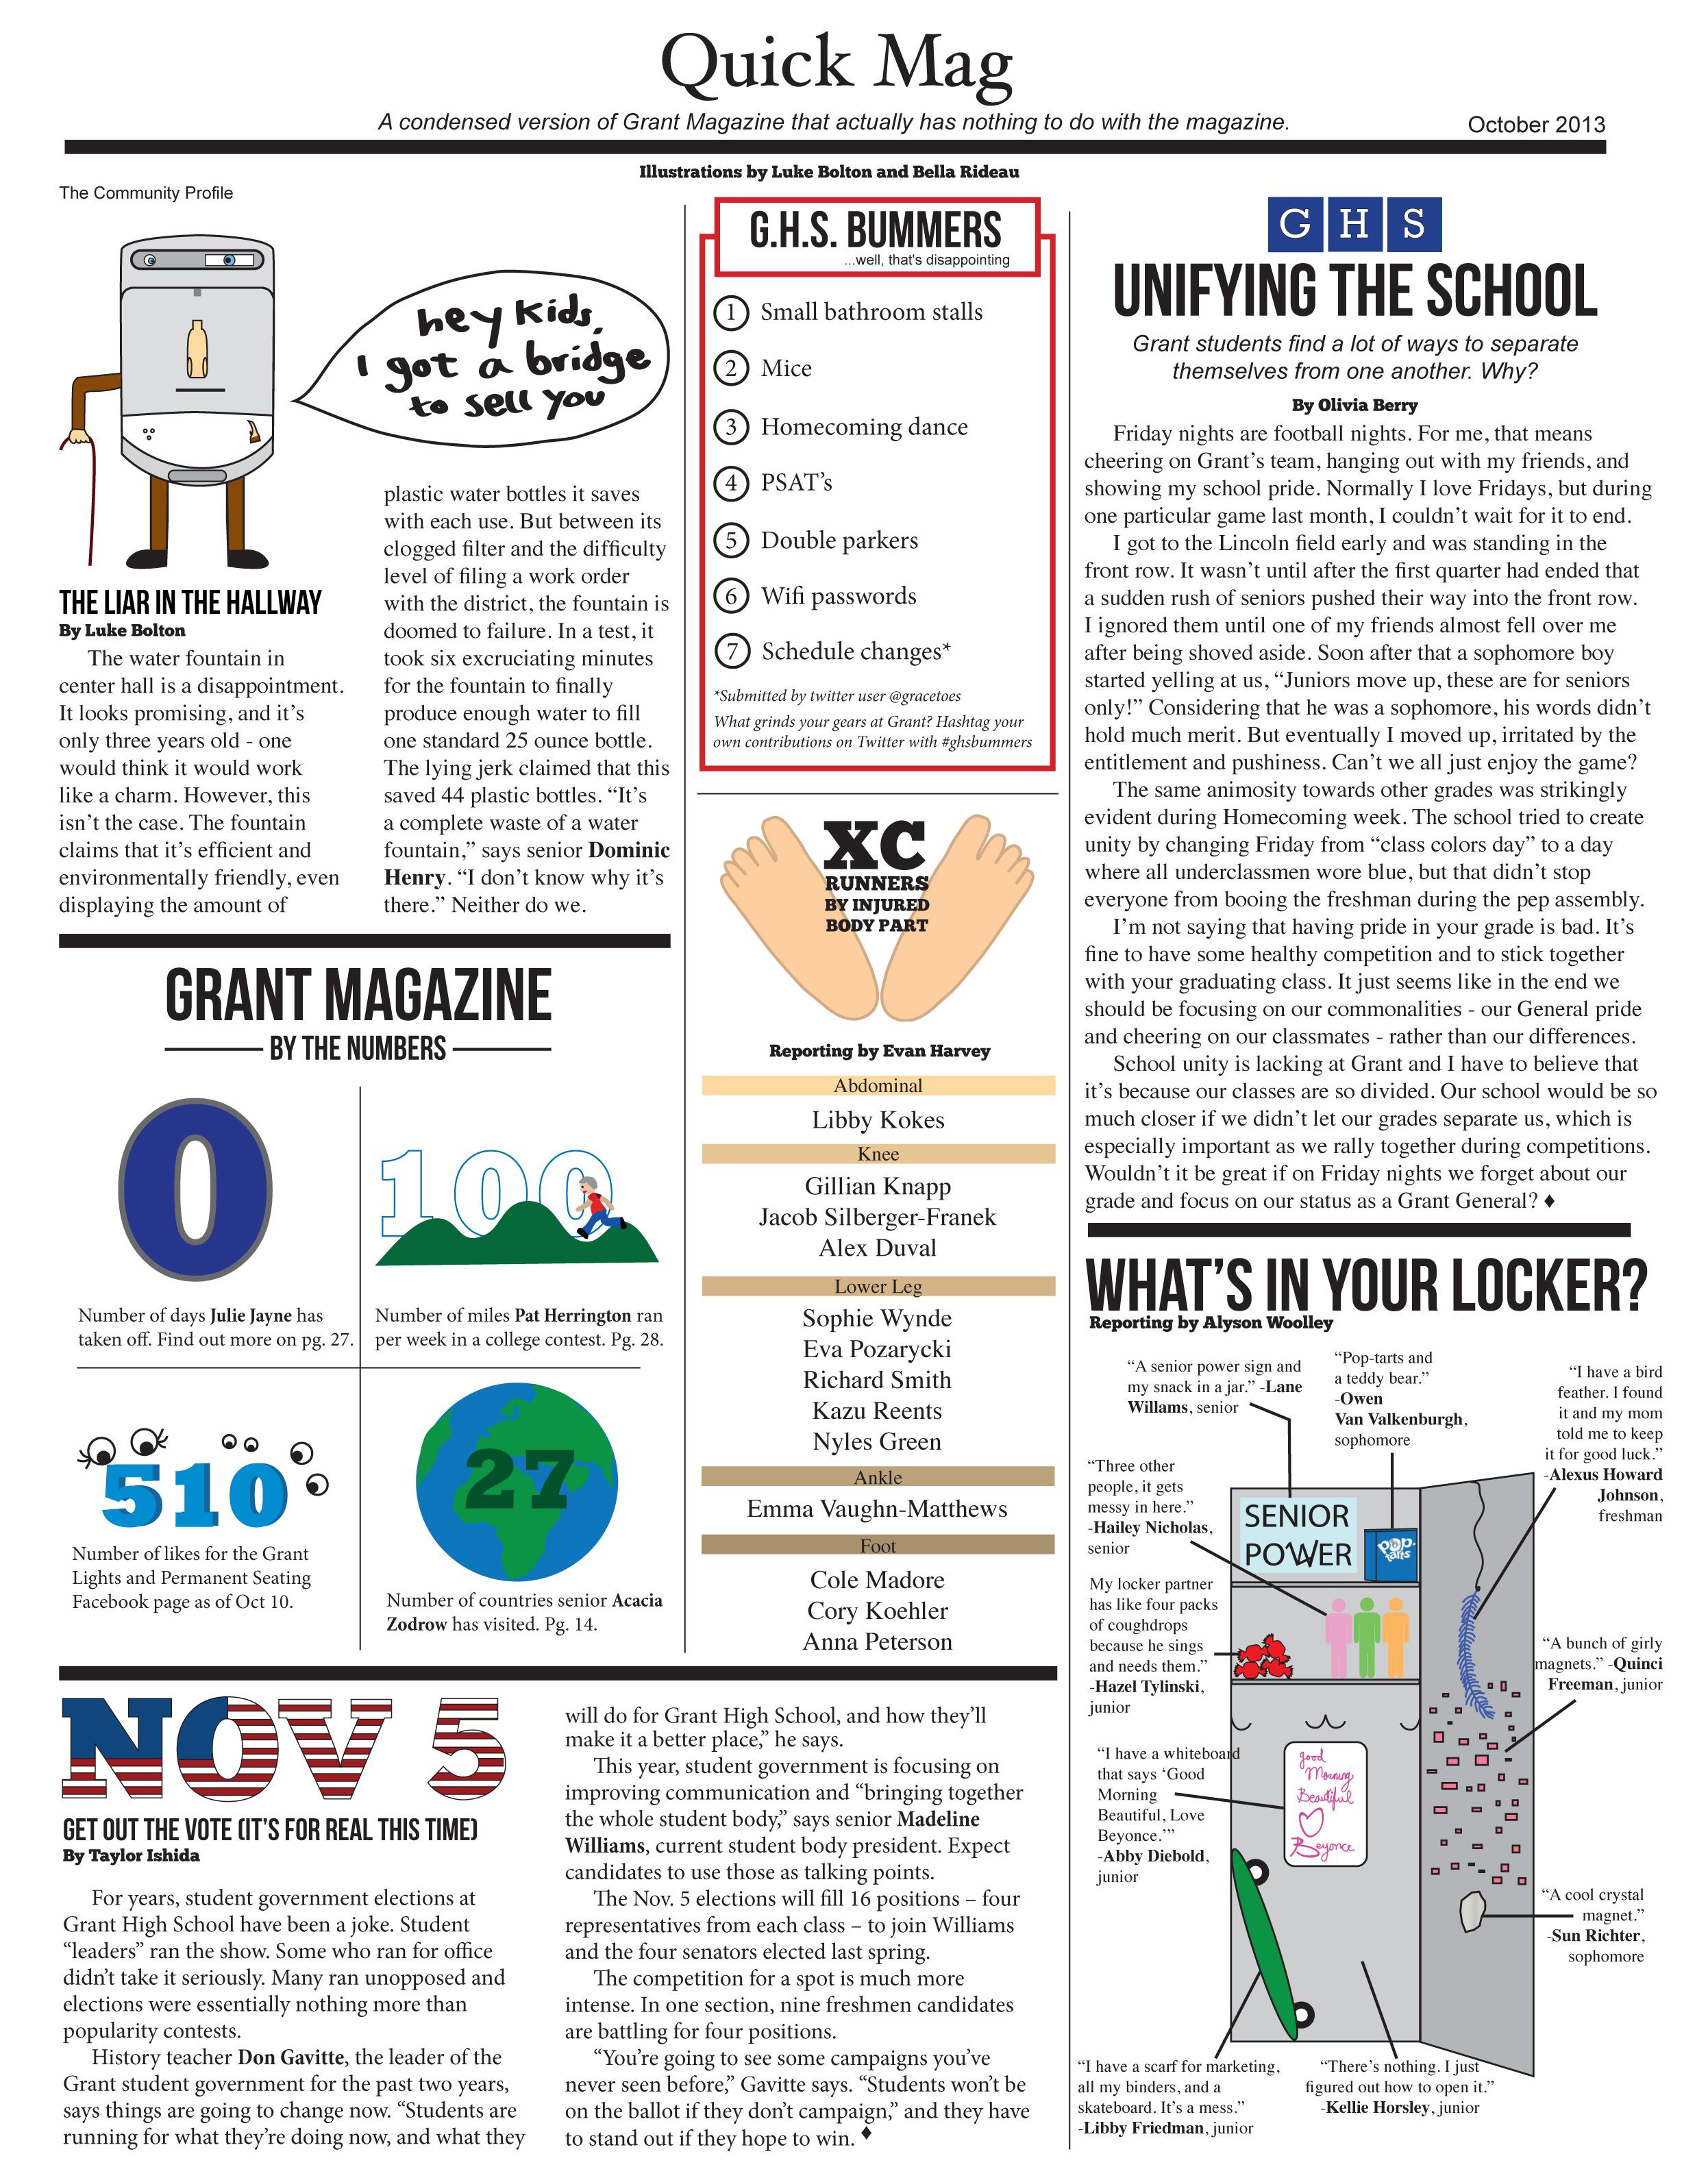 October_Quick_Mag